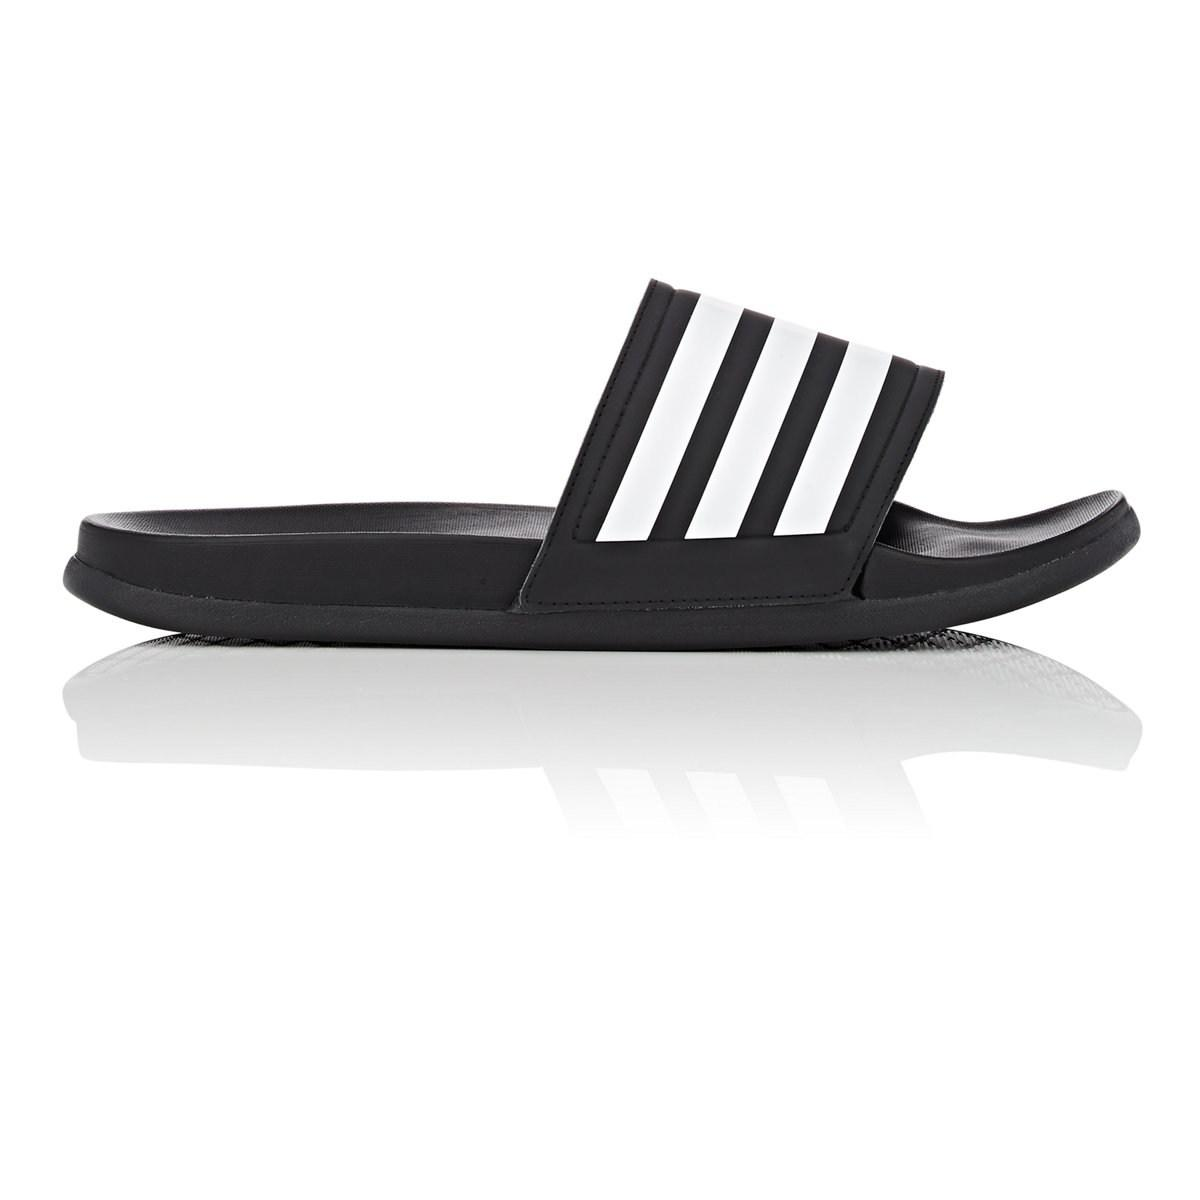 13eec5eb684028 Adidas Adilette Cloudfoam Plus Slide Sandals in Black for Men - Lyst